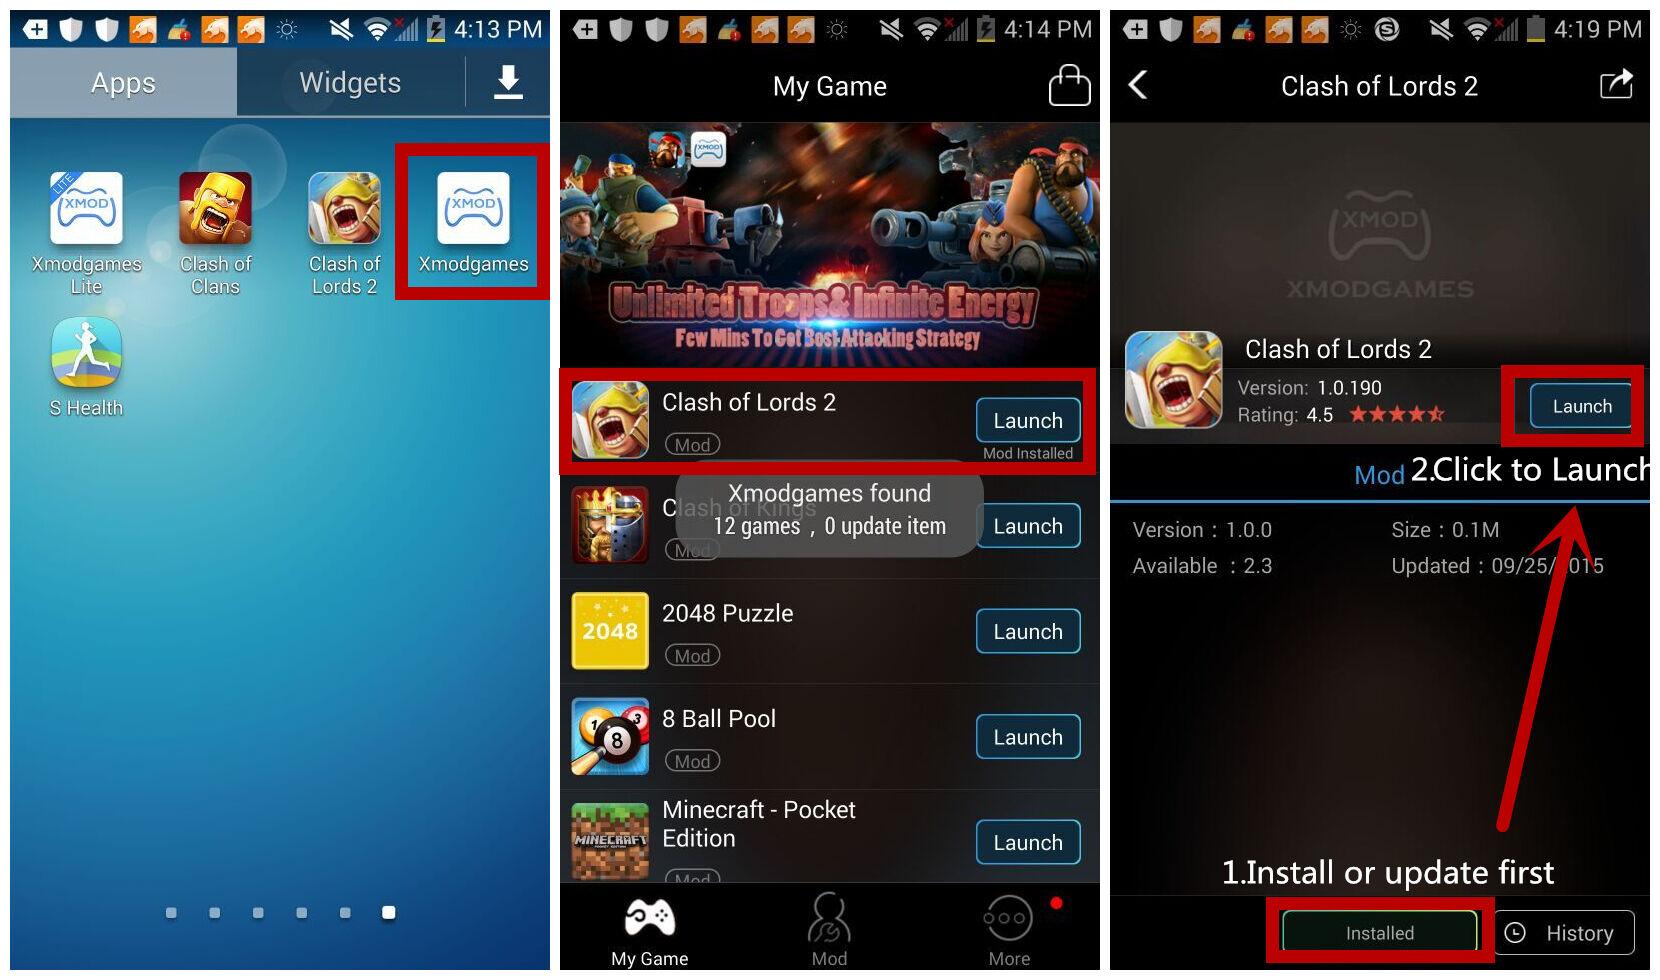 MOD Baru Clash of Lords 2 di Android dengan Xmodgames